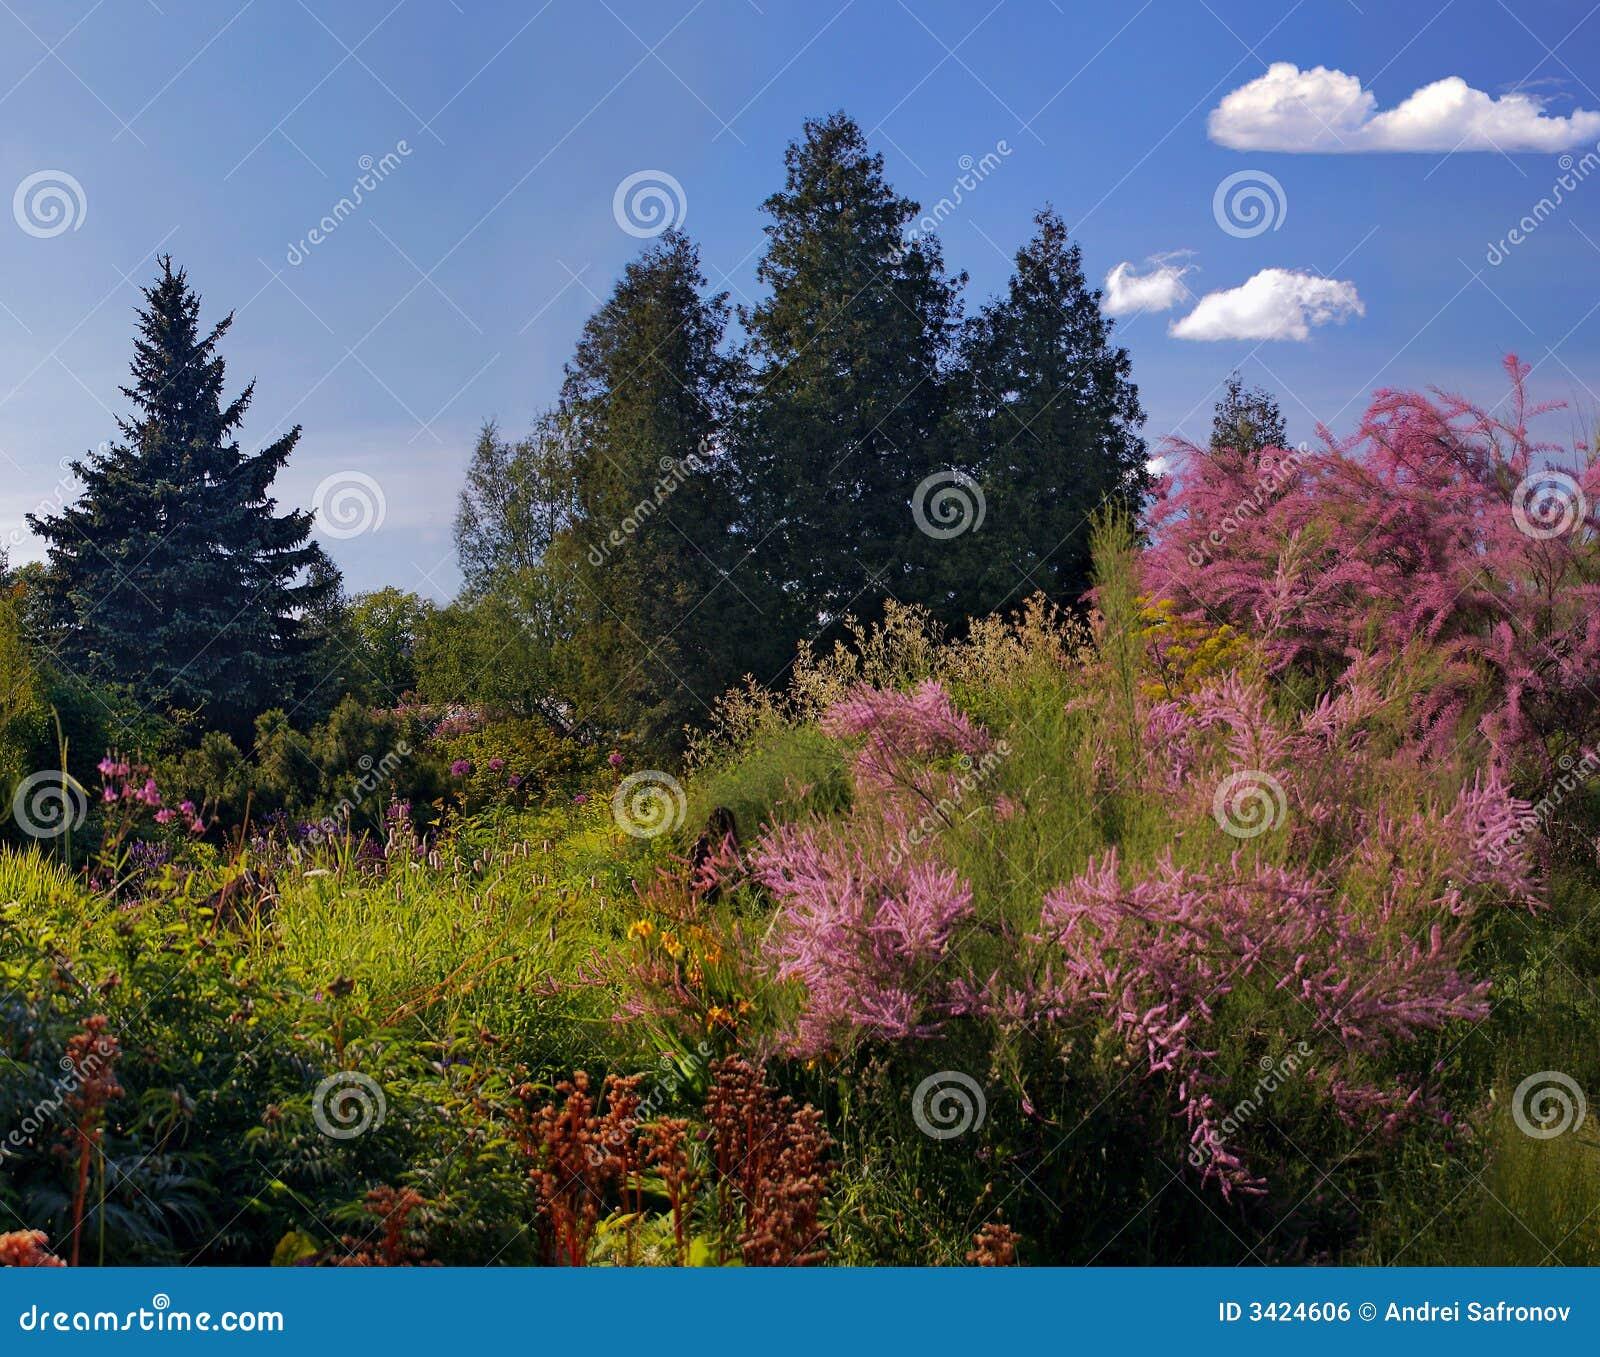 Botanical Gardens Royalty Free Stock Image Image 3424606